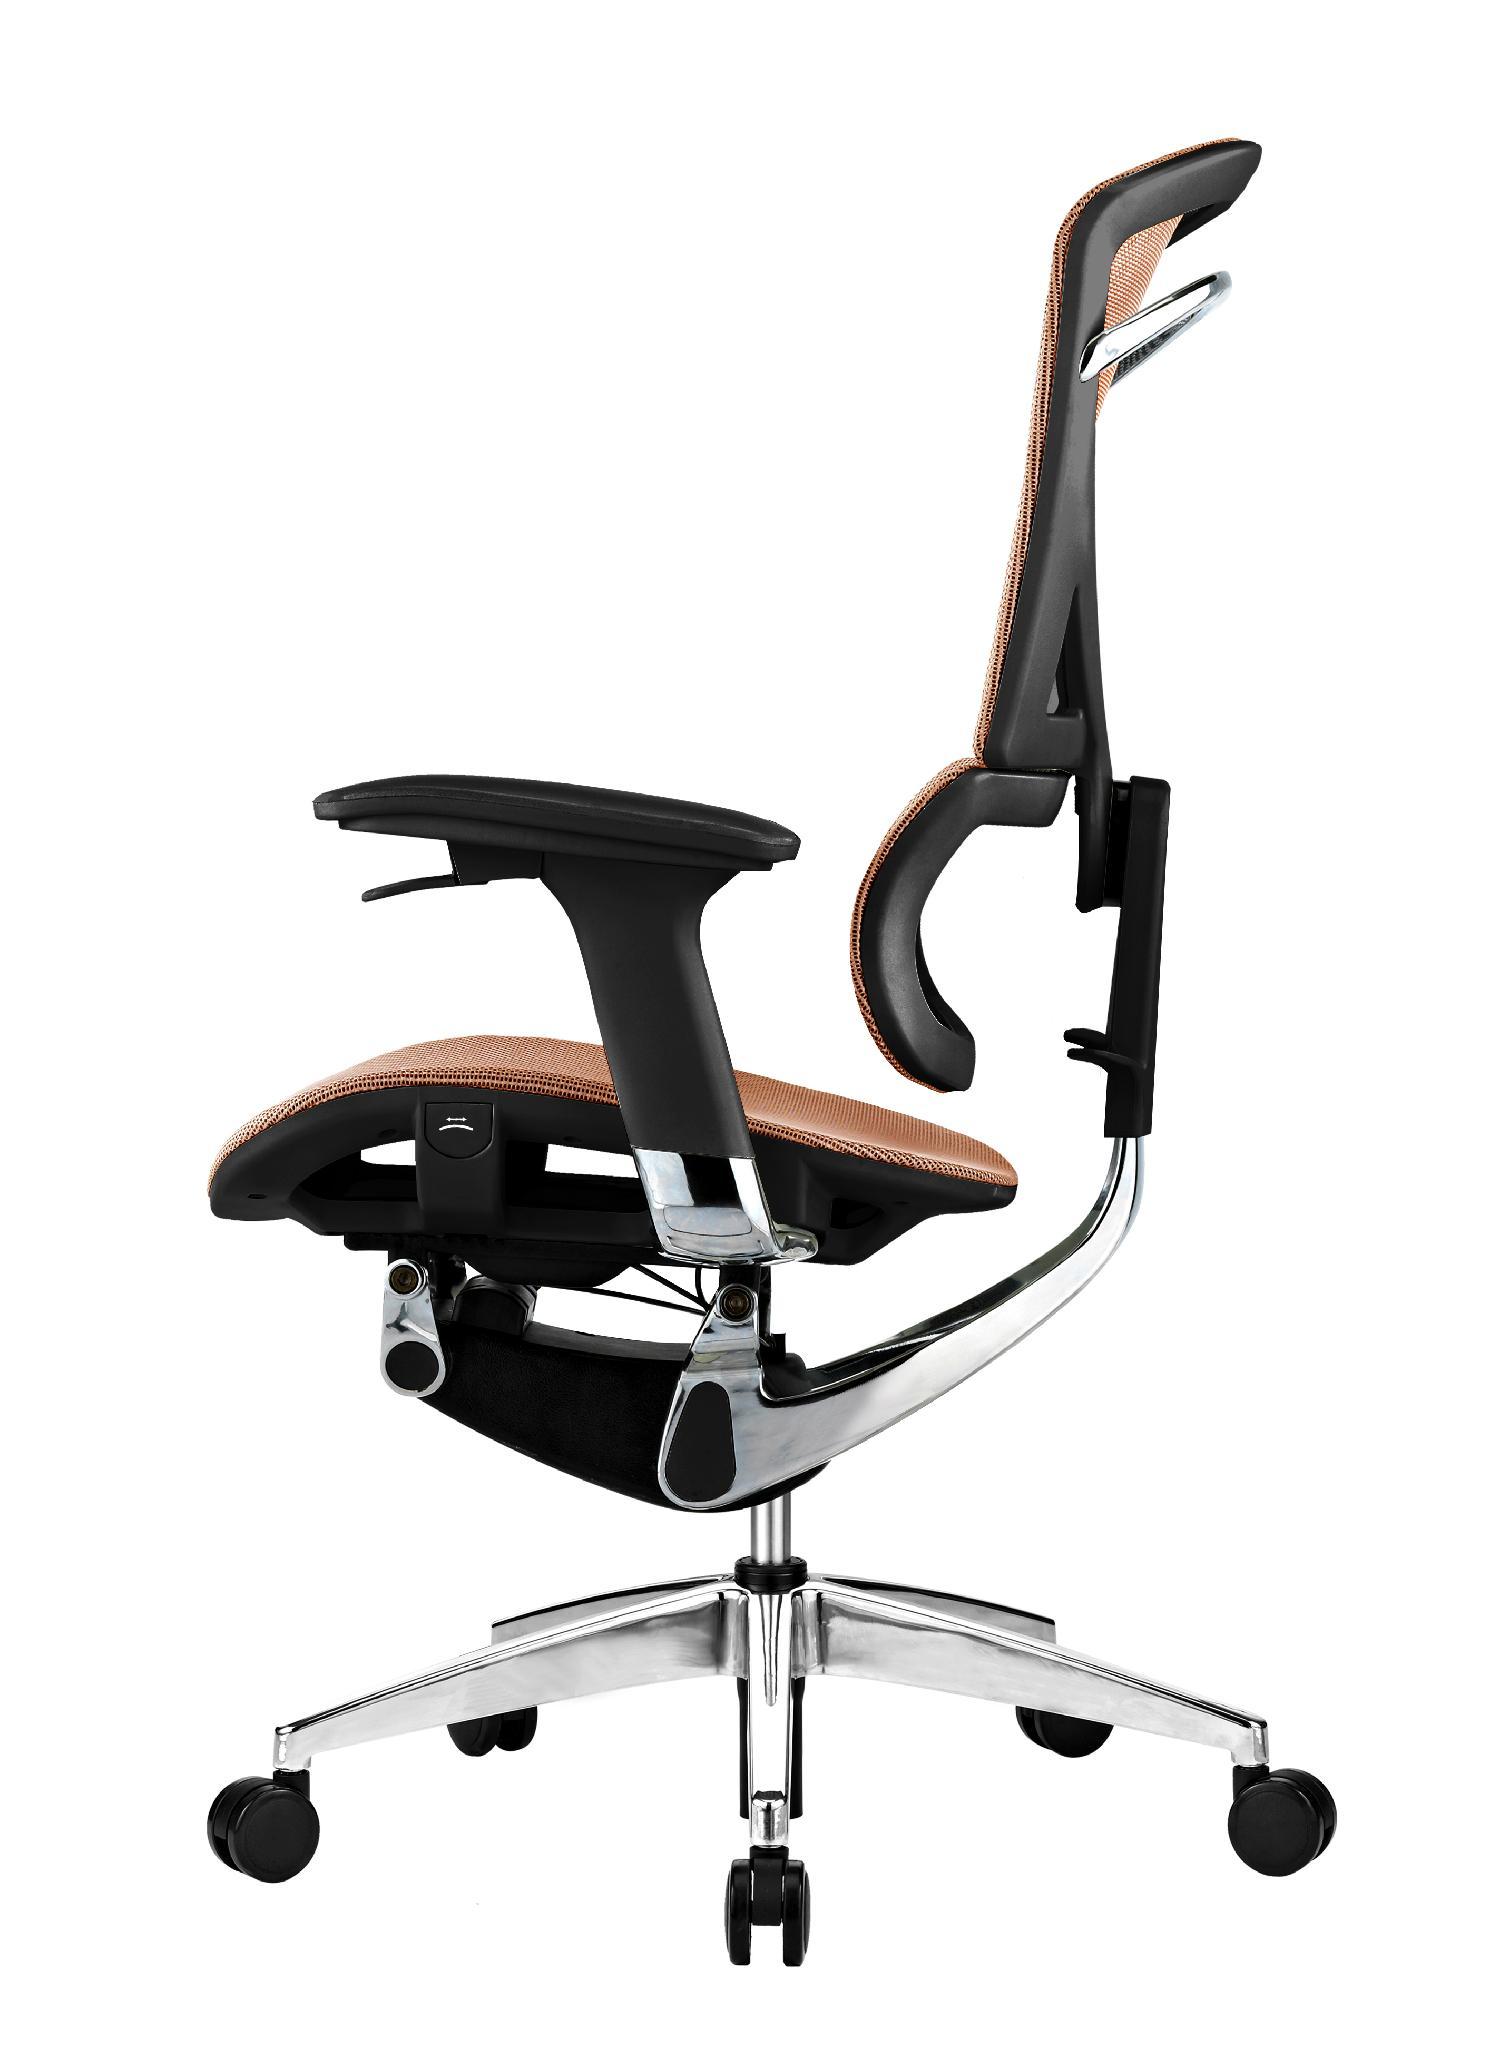 Ergonomic office chair 1